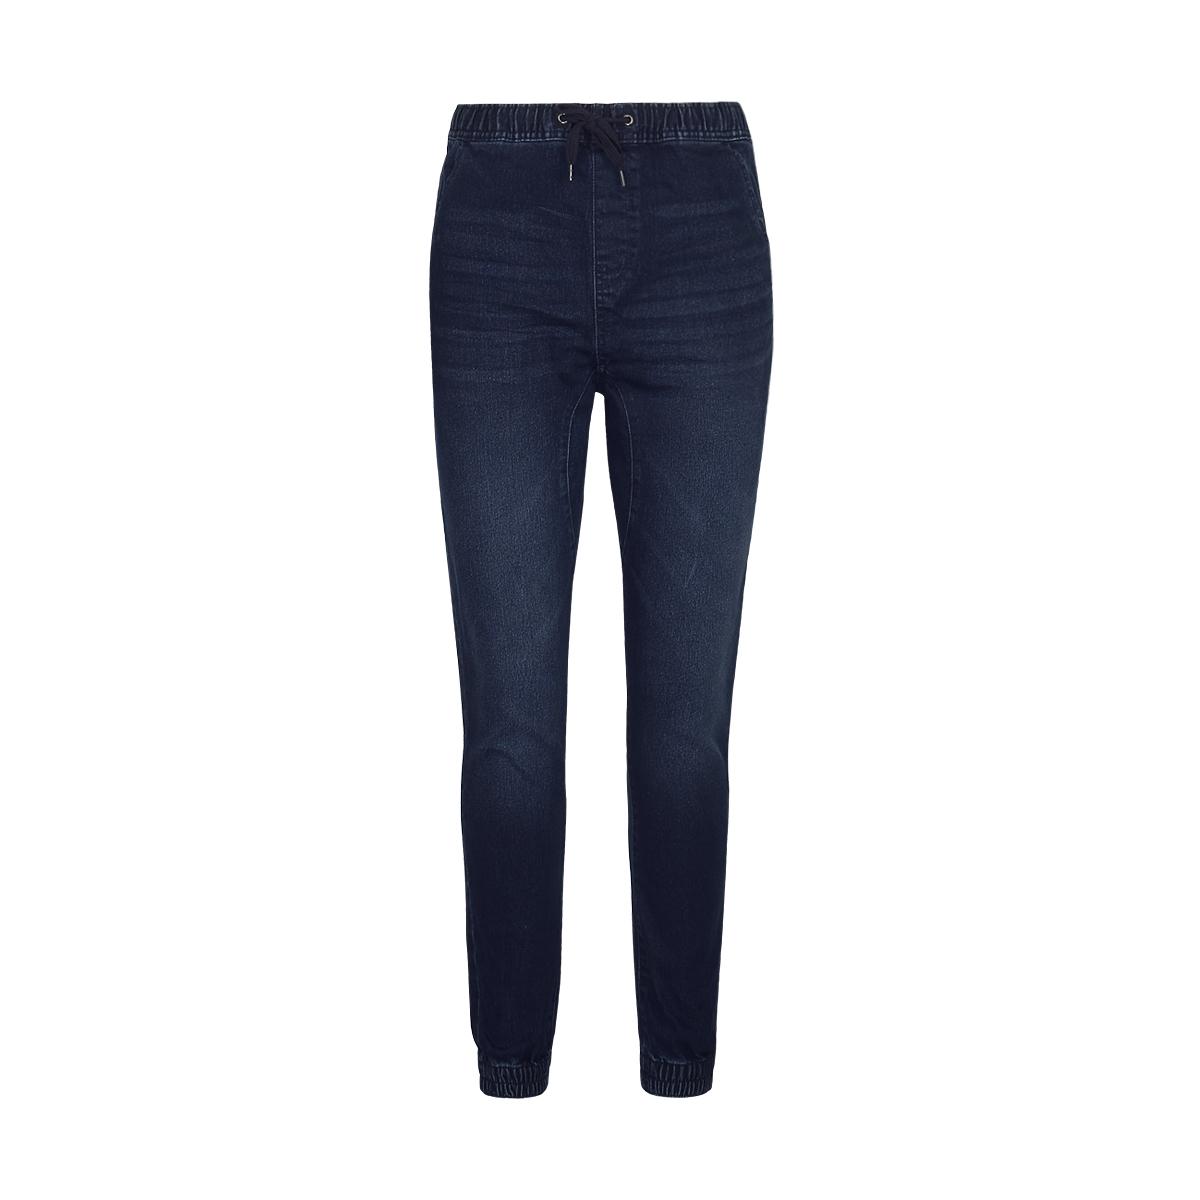 121c68b4 Denim Jogger Pants | Kmart